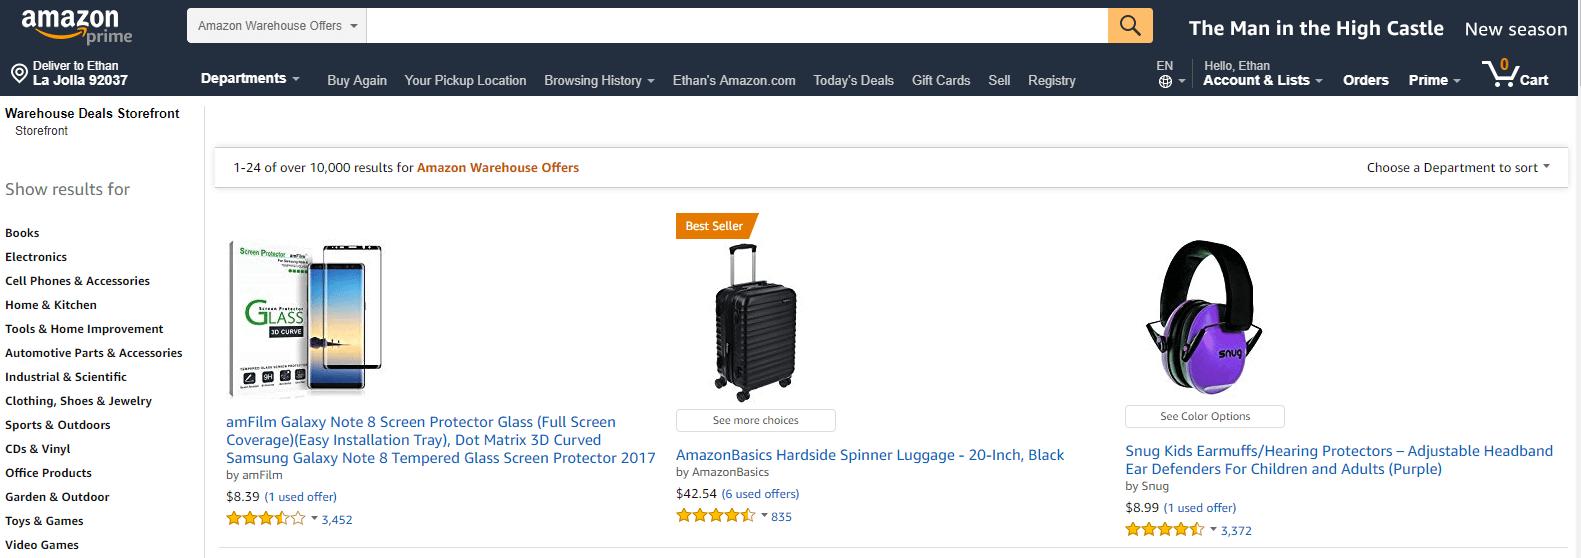 amazon-warehouse-deals-storefront